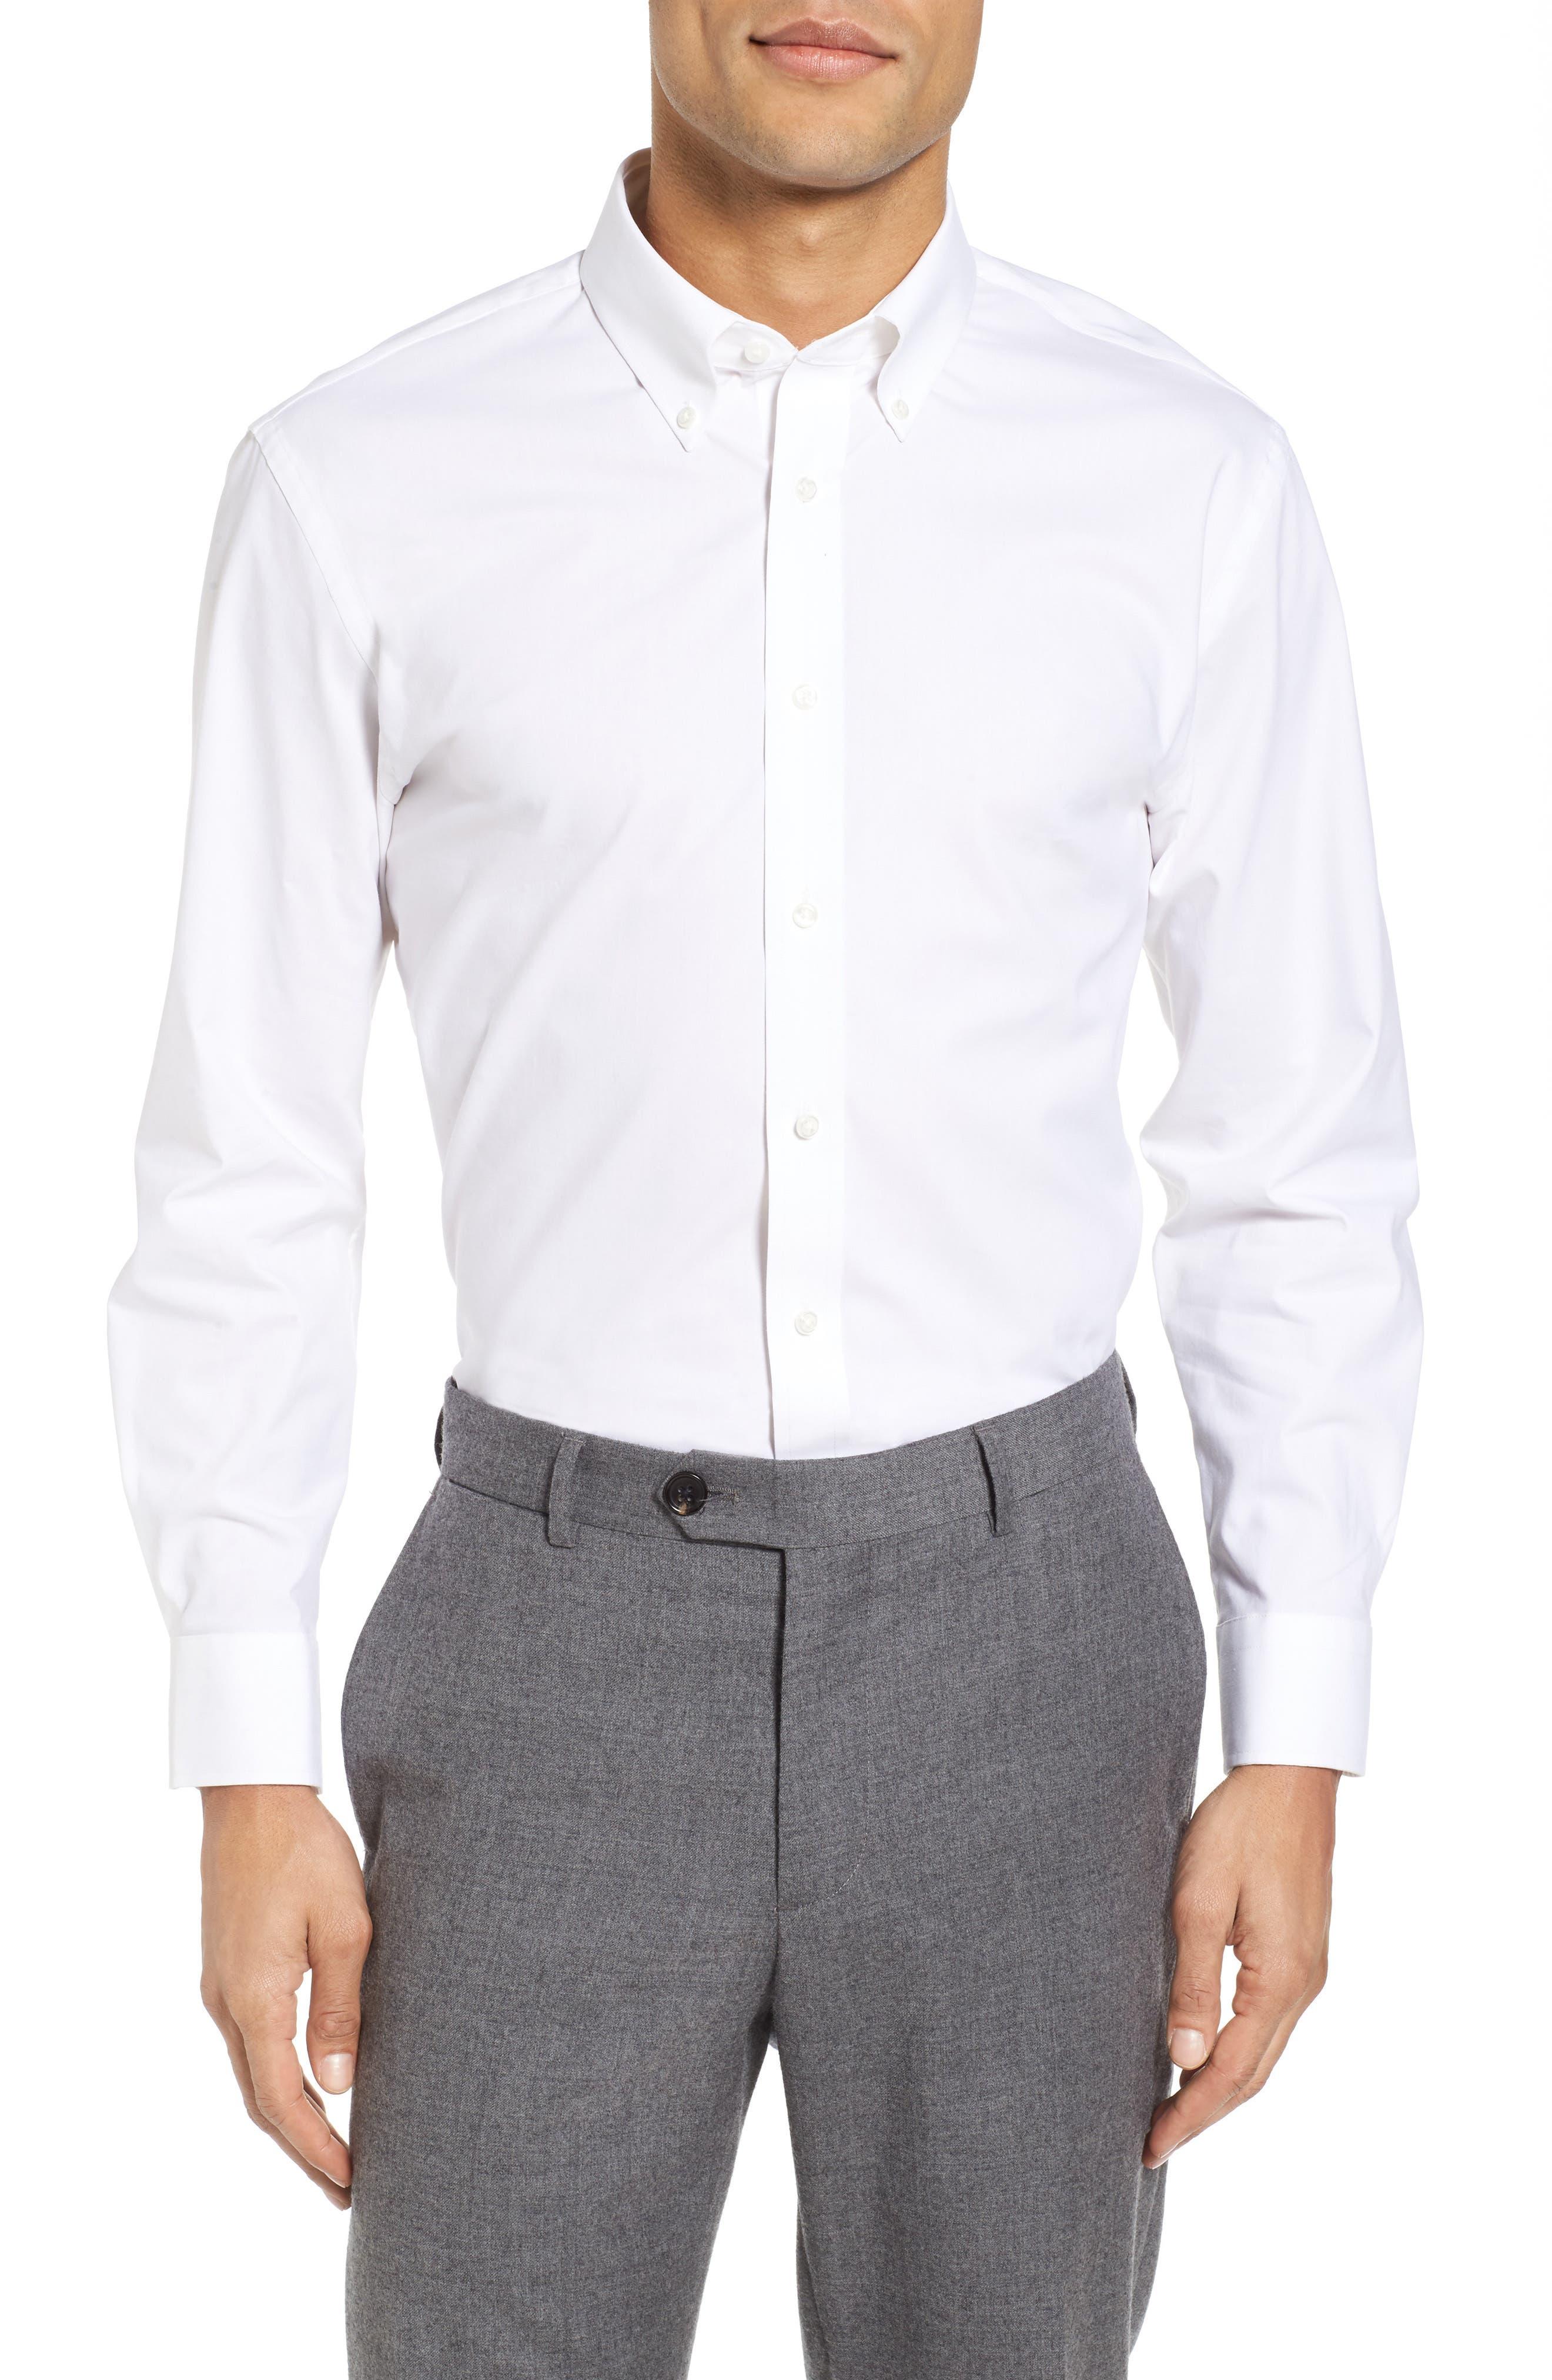 Tech-Smart Trim Fit Stretch Solid Dress Shirt,                         Main,                         color, White